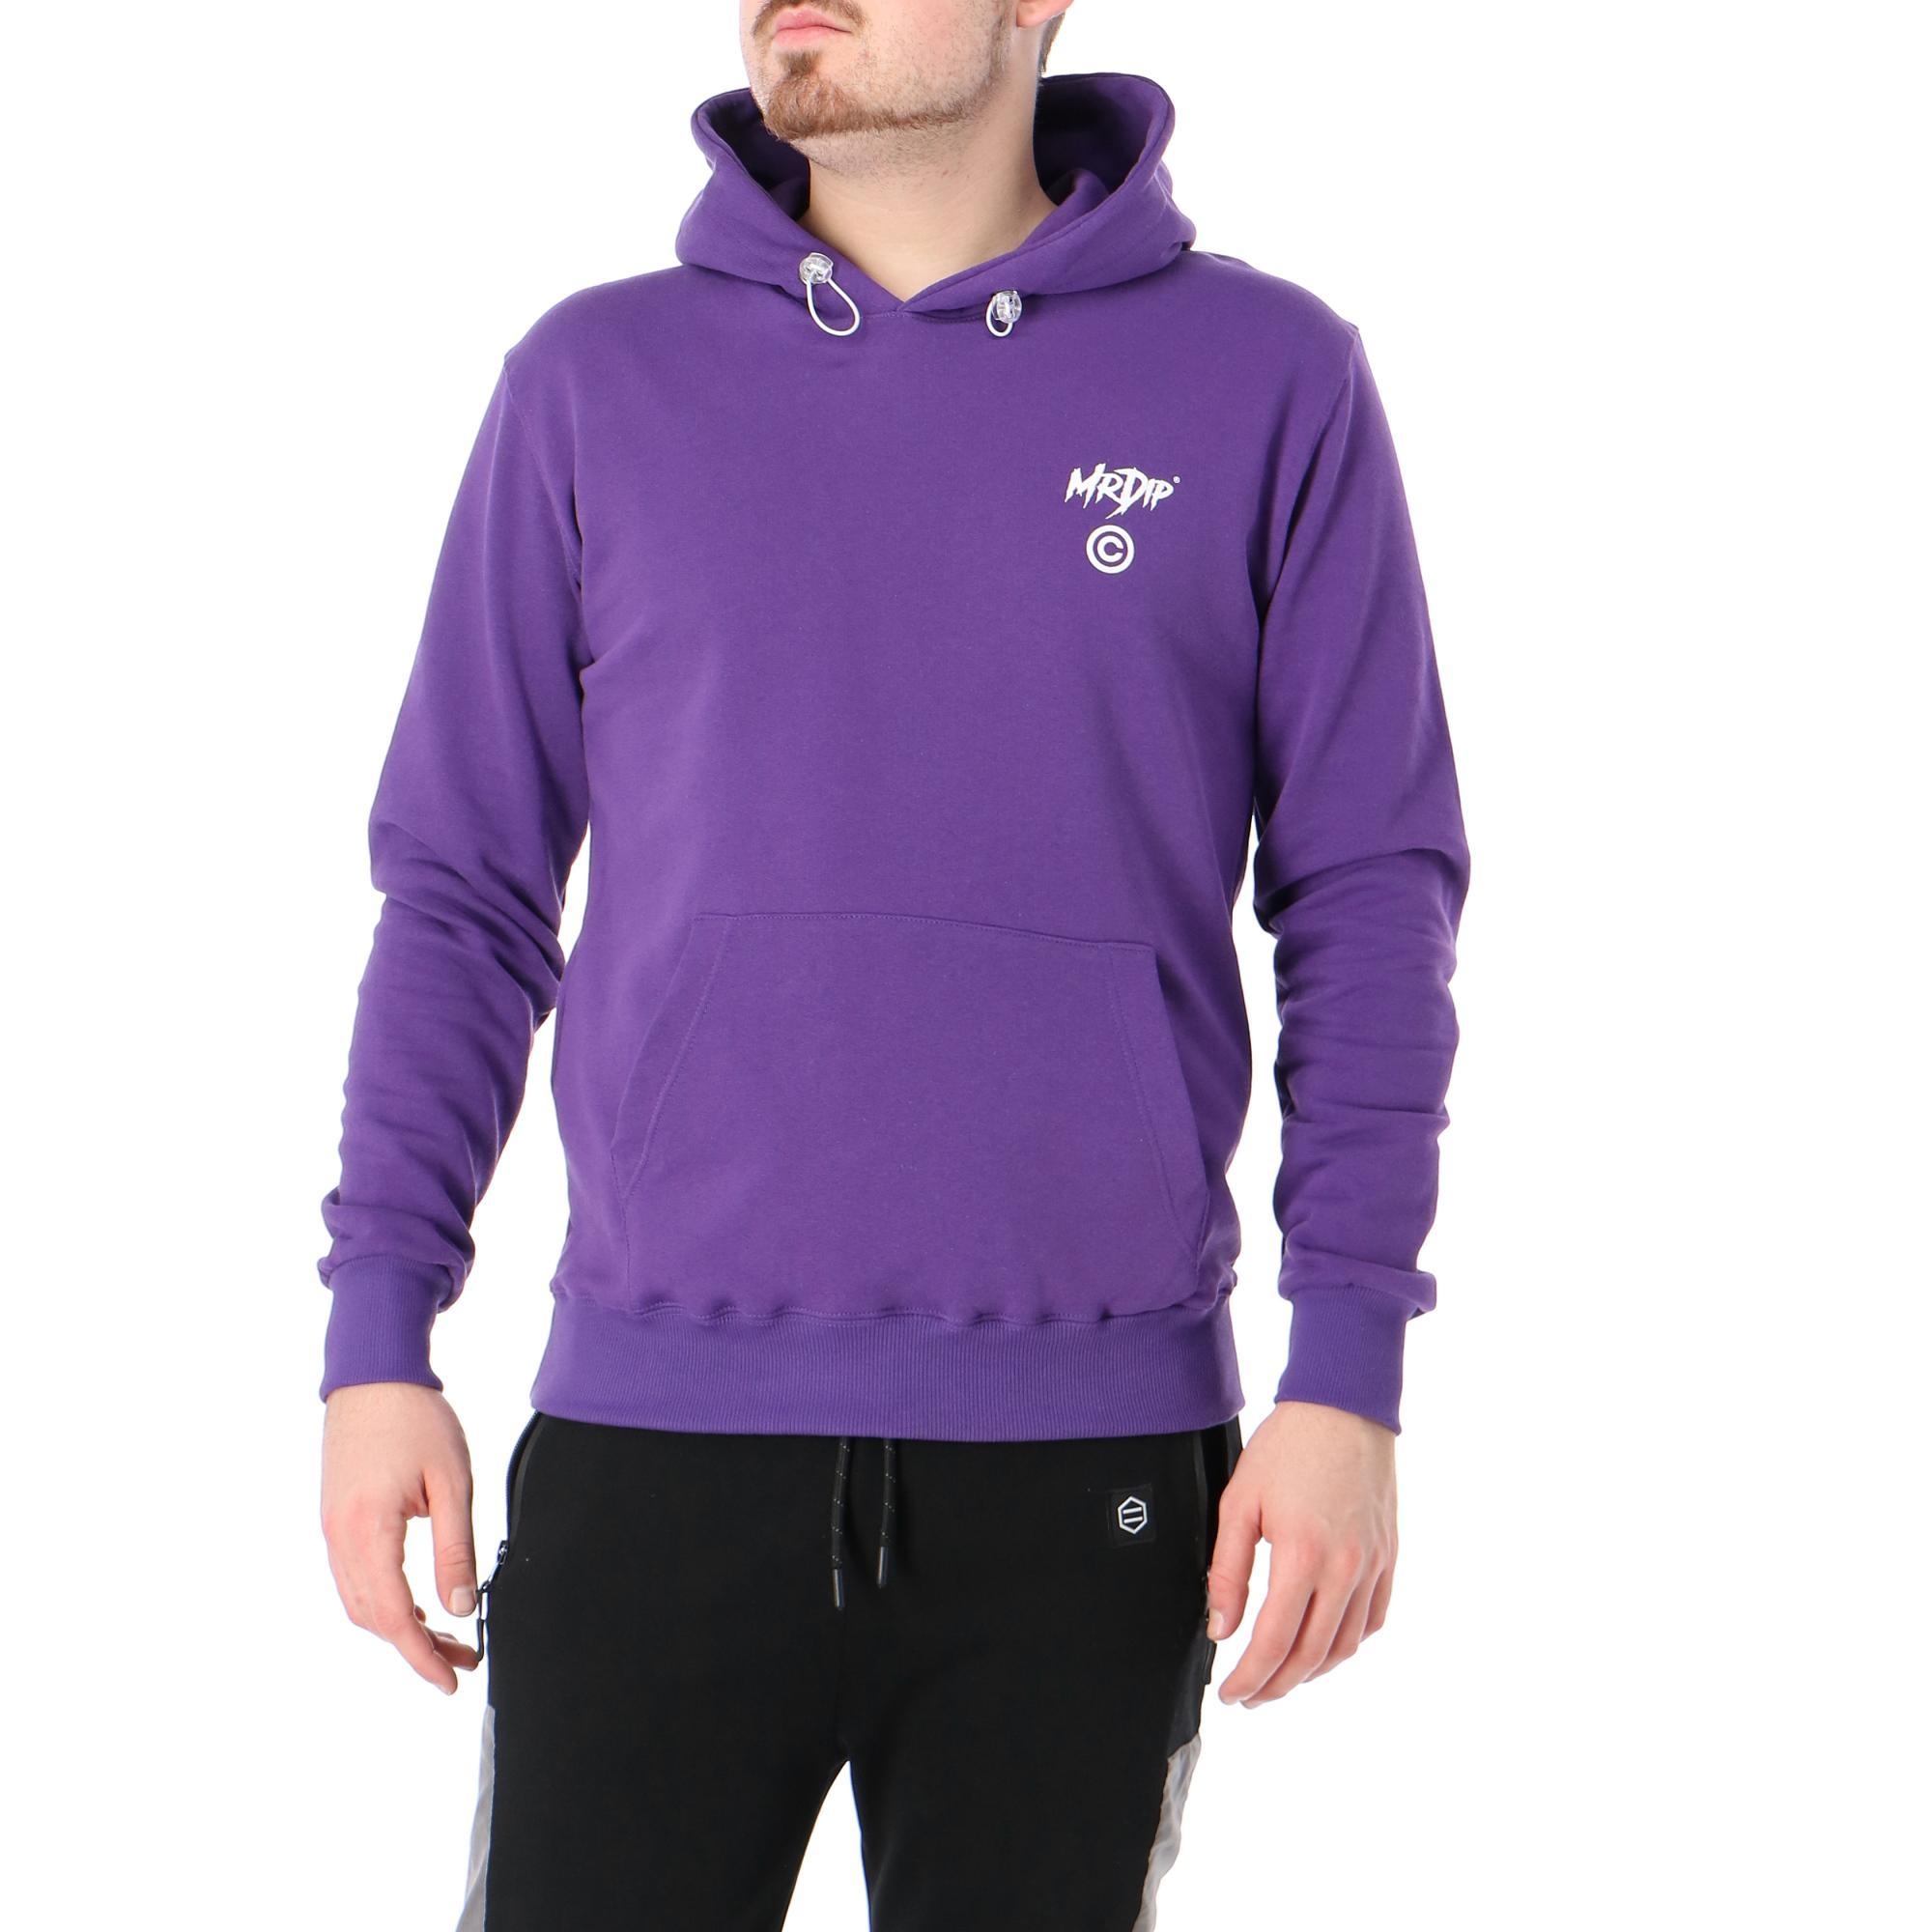 Mr Dip Info Hoodie Purple white